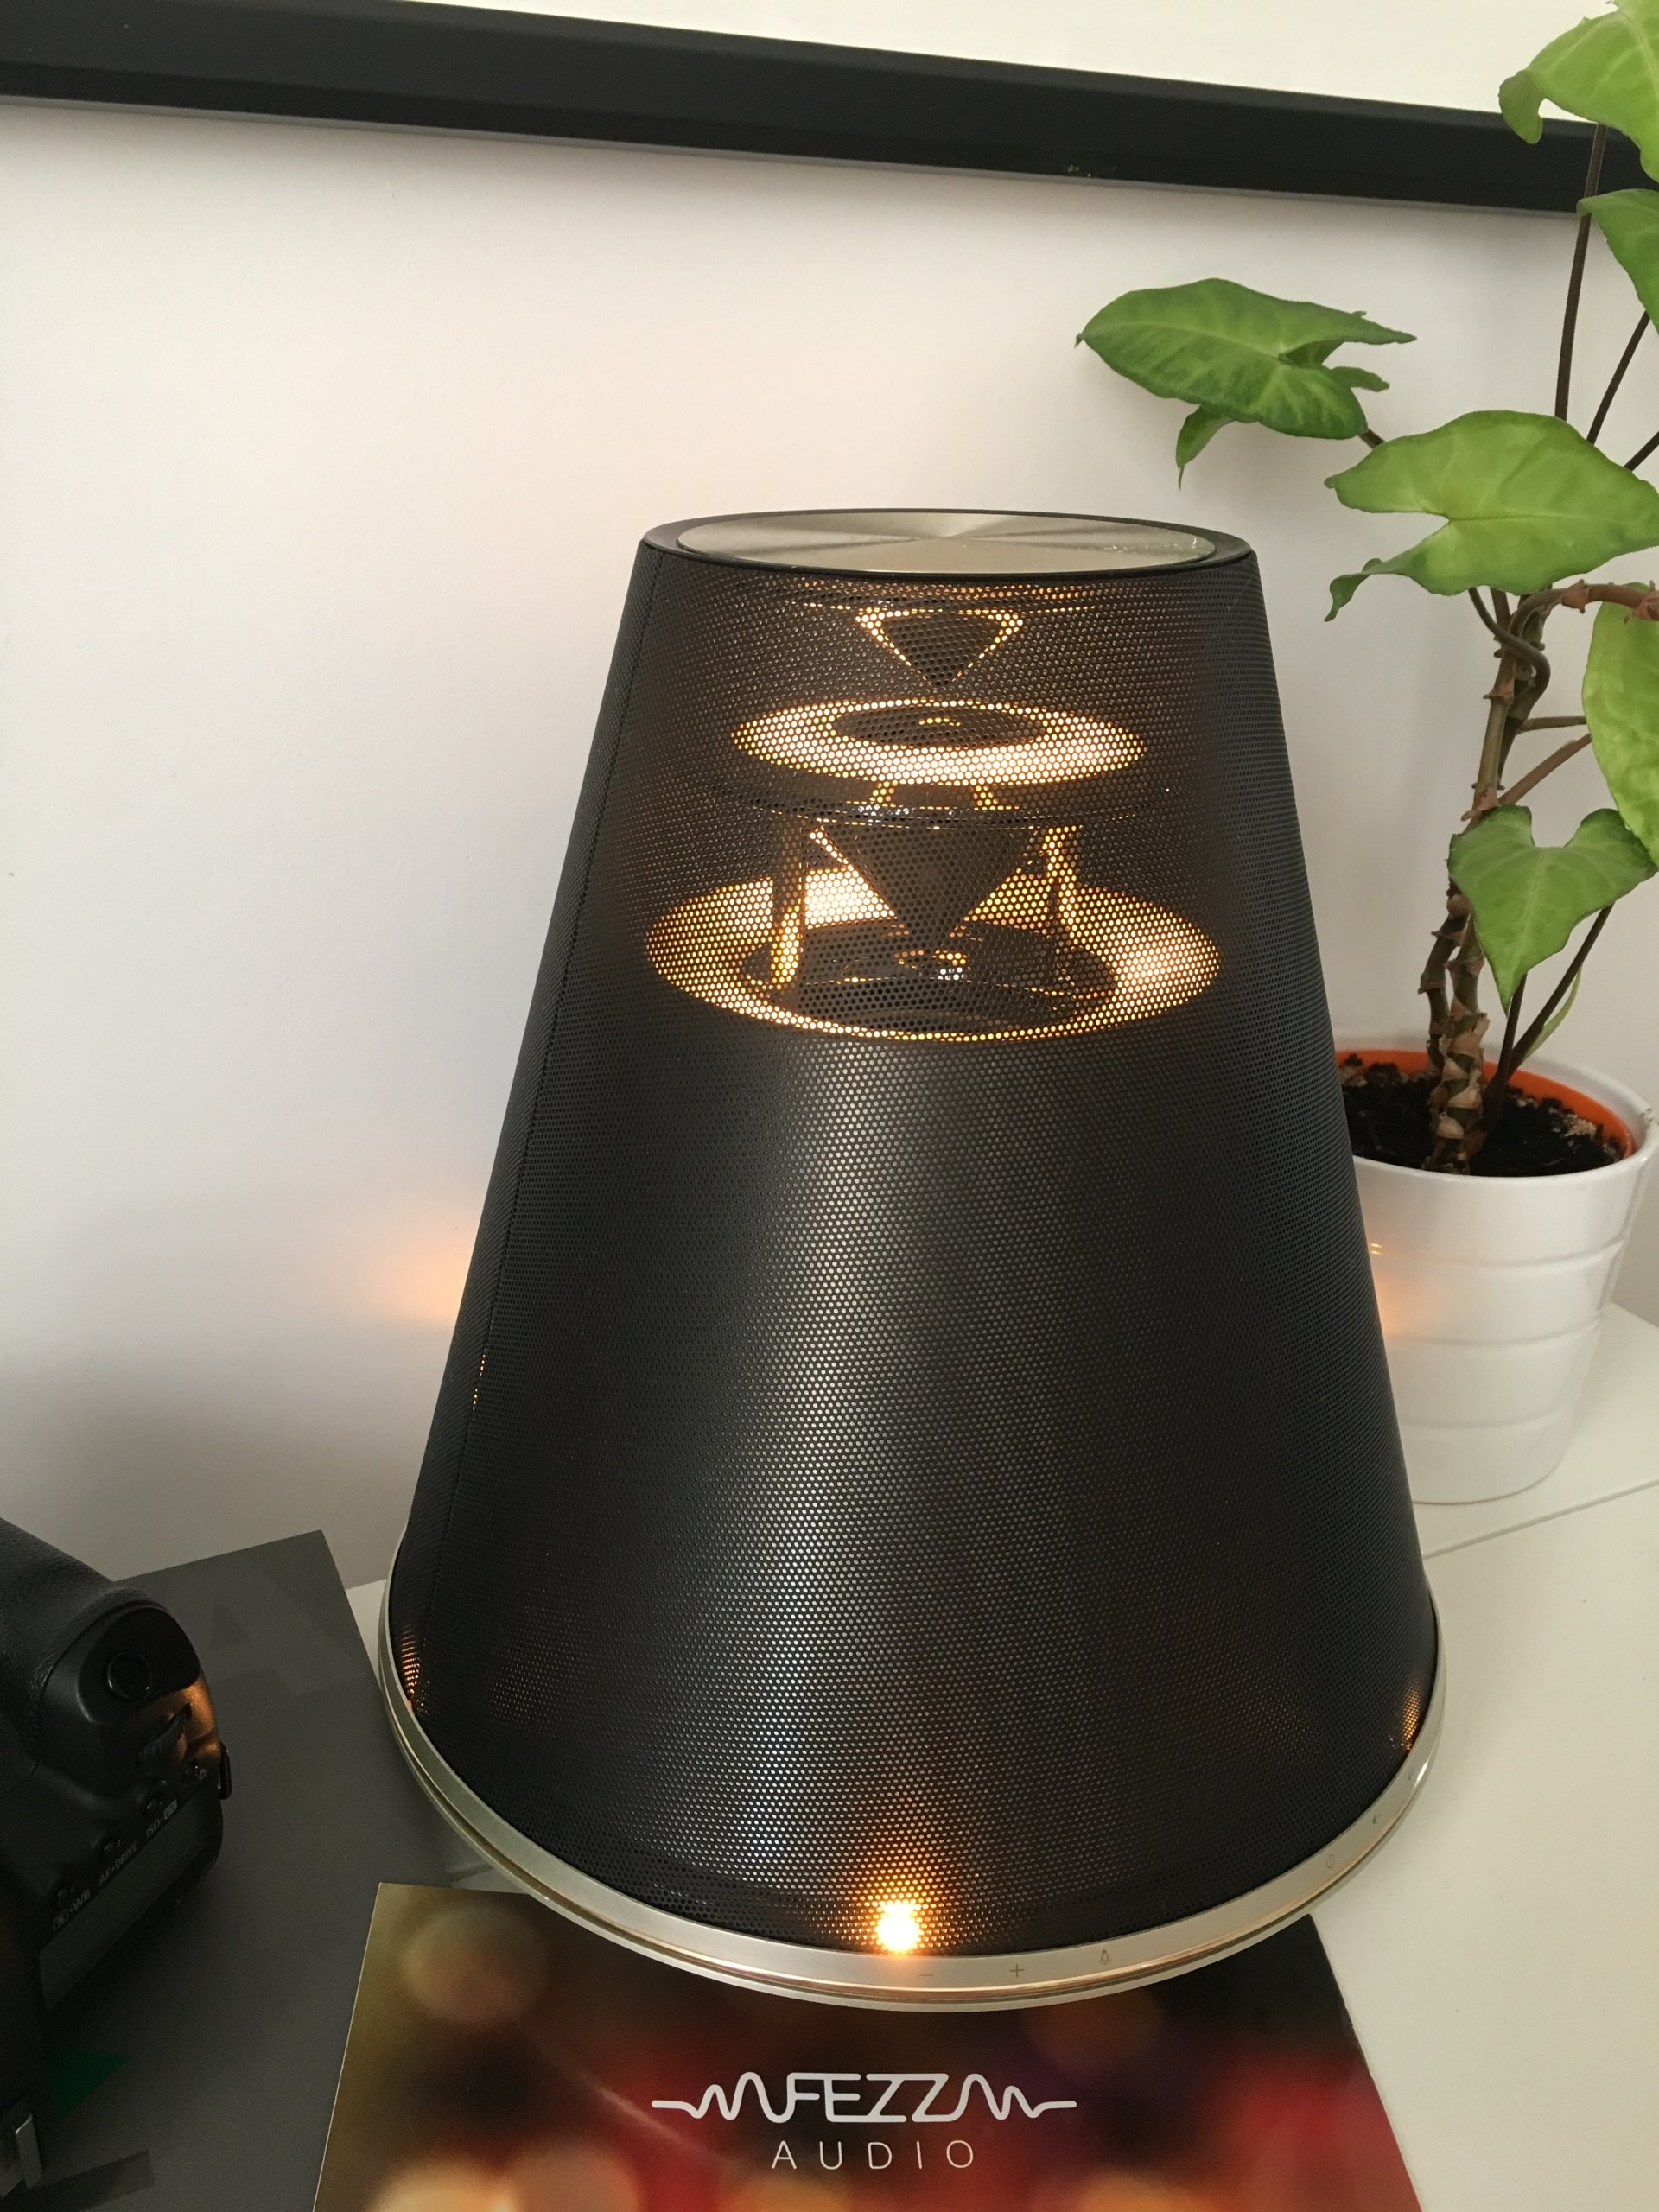 jak nowy yamaha lsx 170 relit gwar bose jbl sony. Black Bedroom Furniture Sets. Home Design Ideas